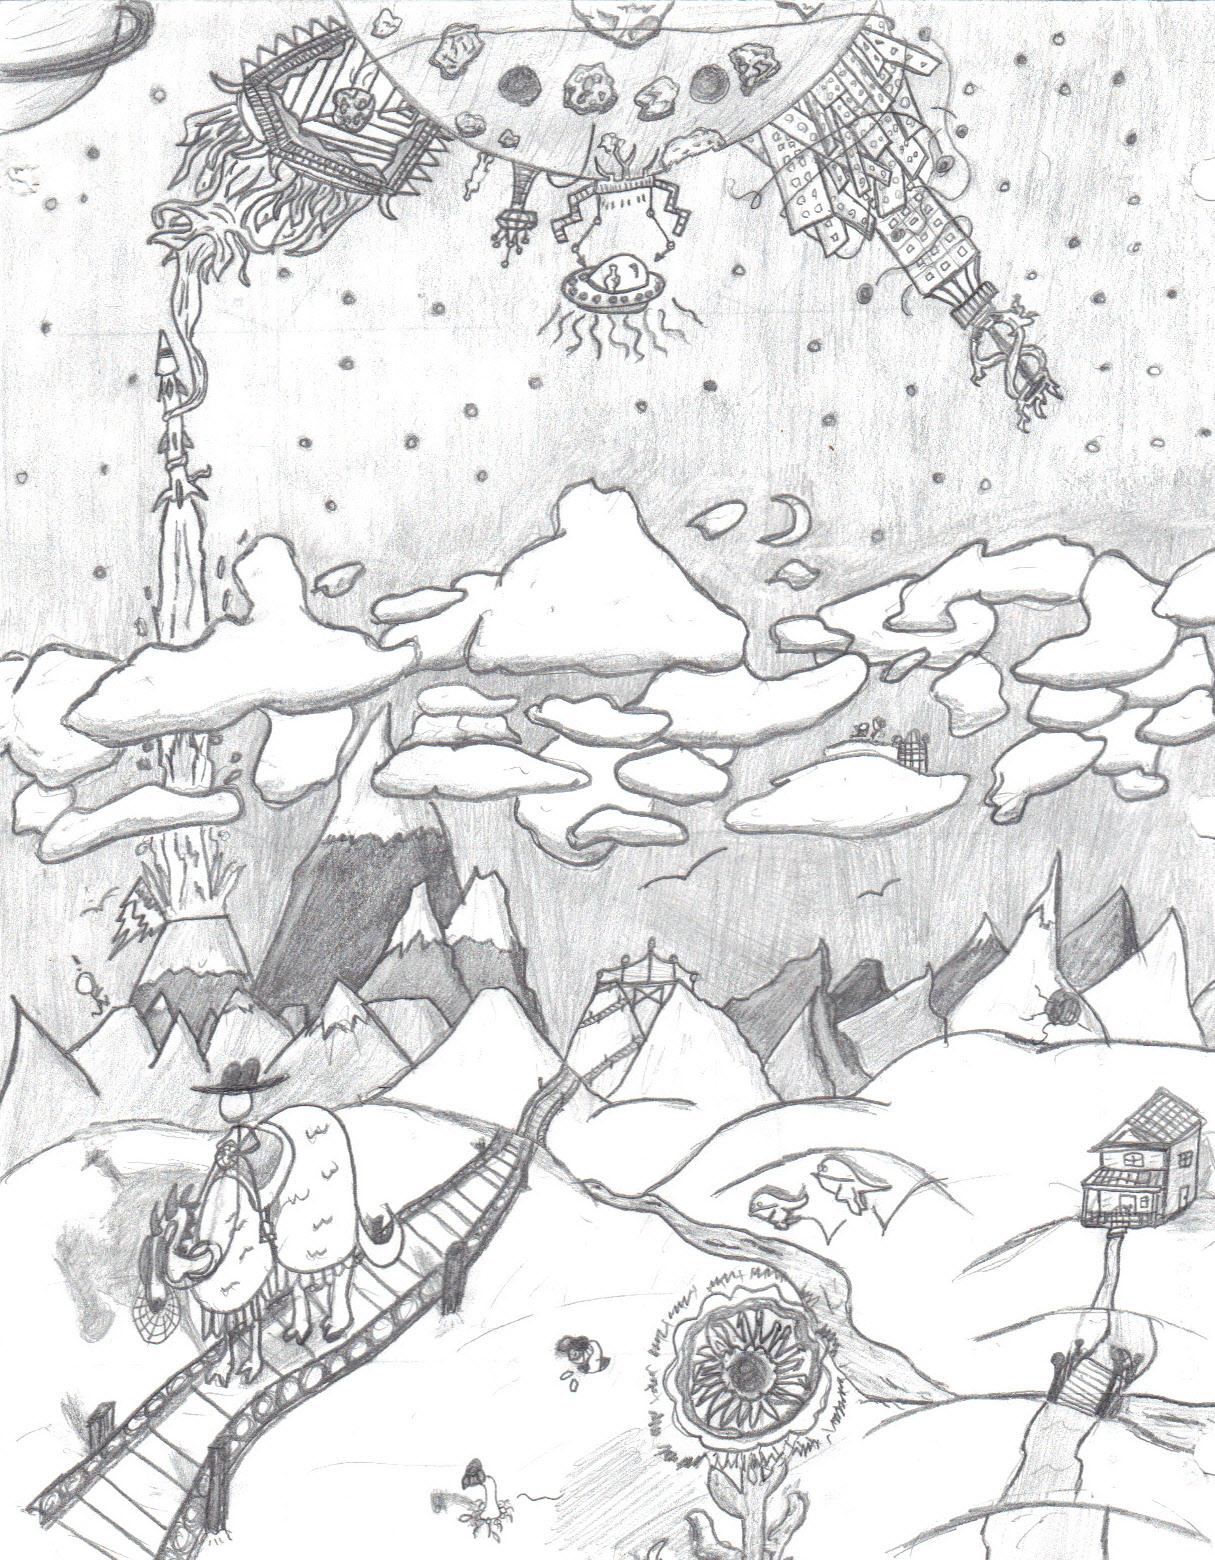 Odd planetscape